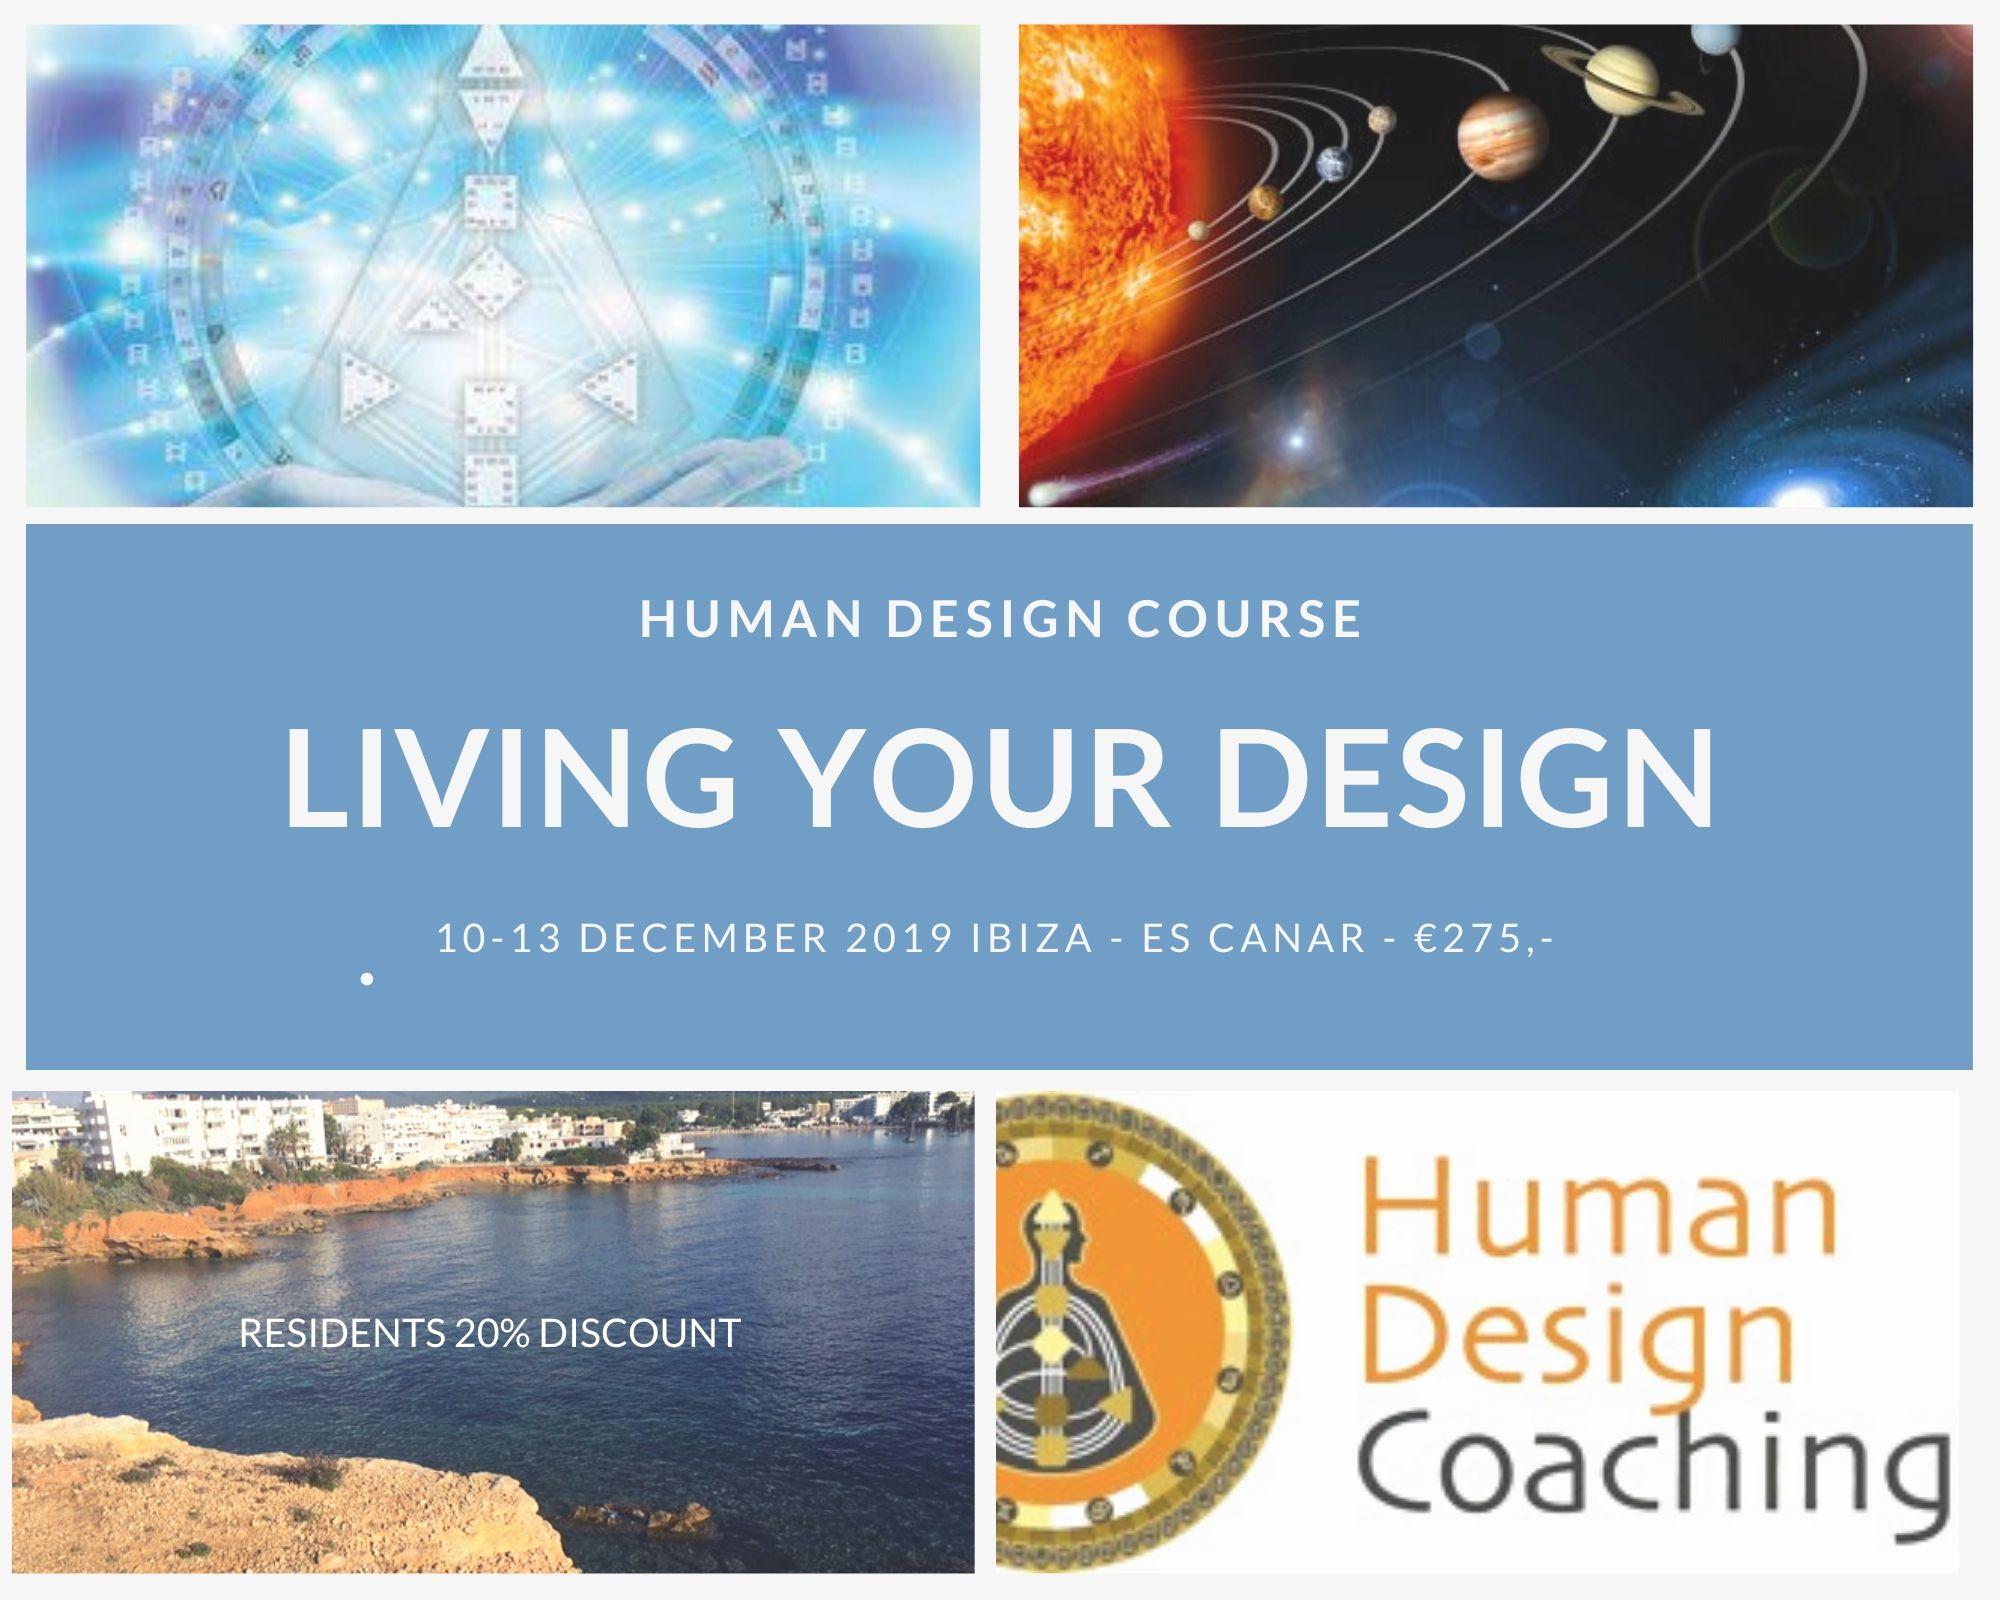 Living Your Design course in Ibiza 10-13 December 2019